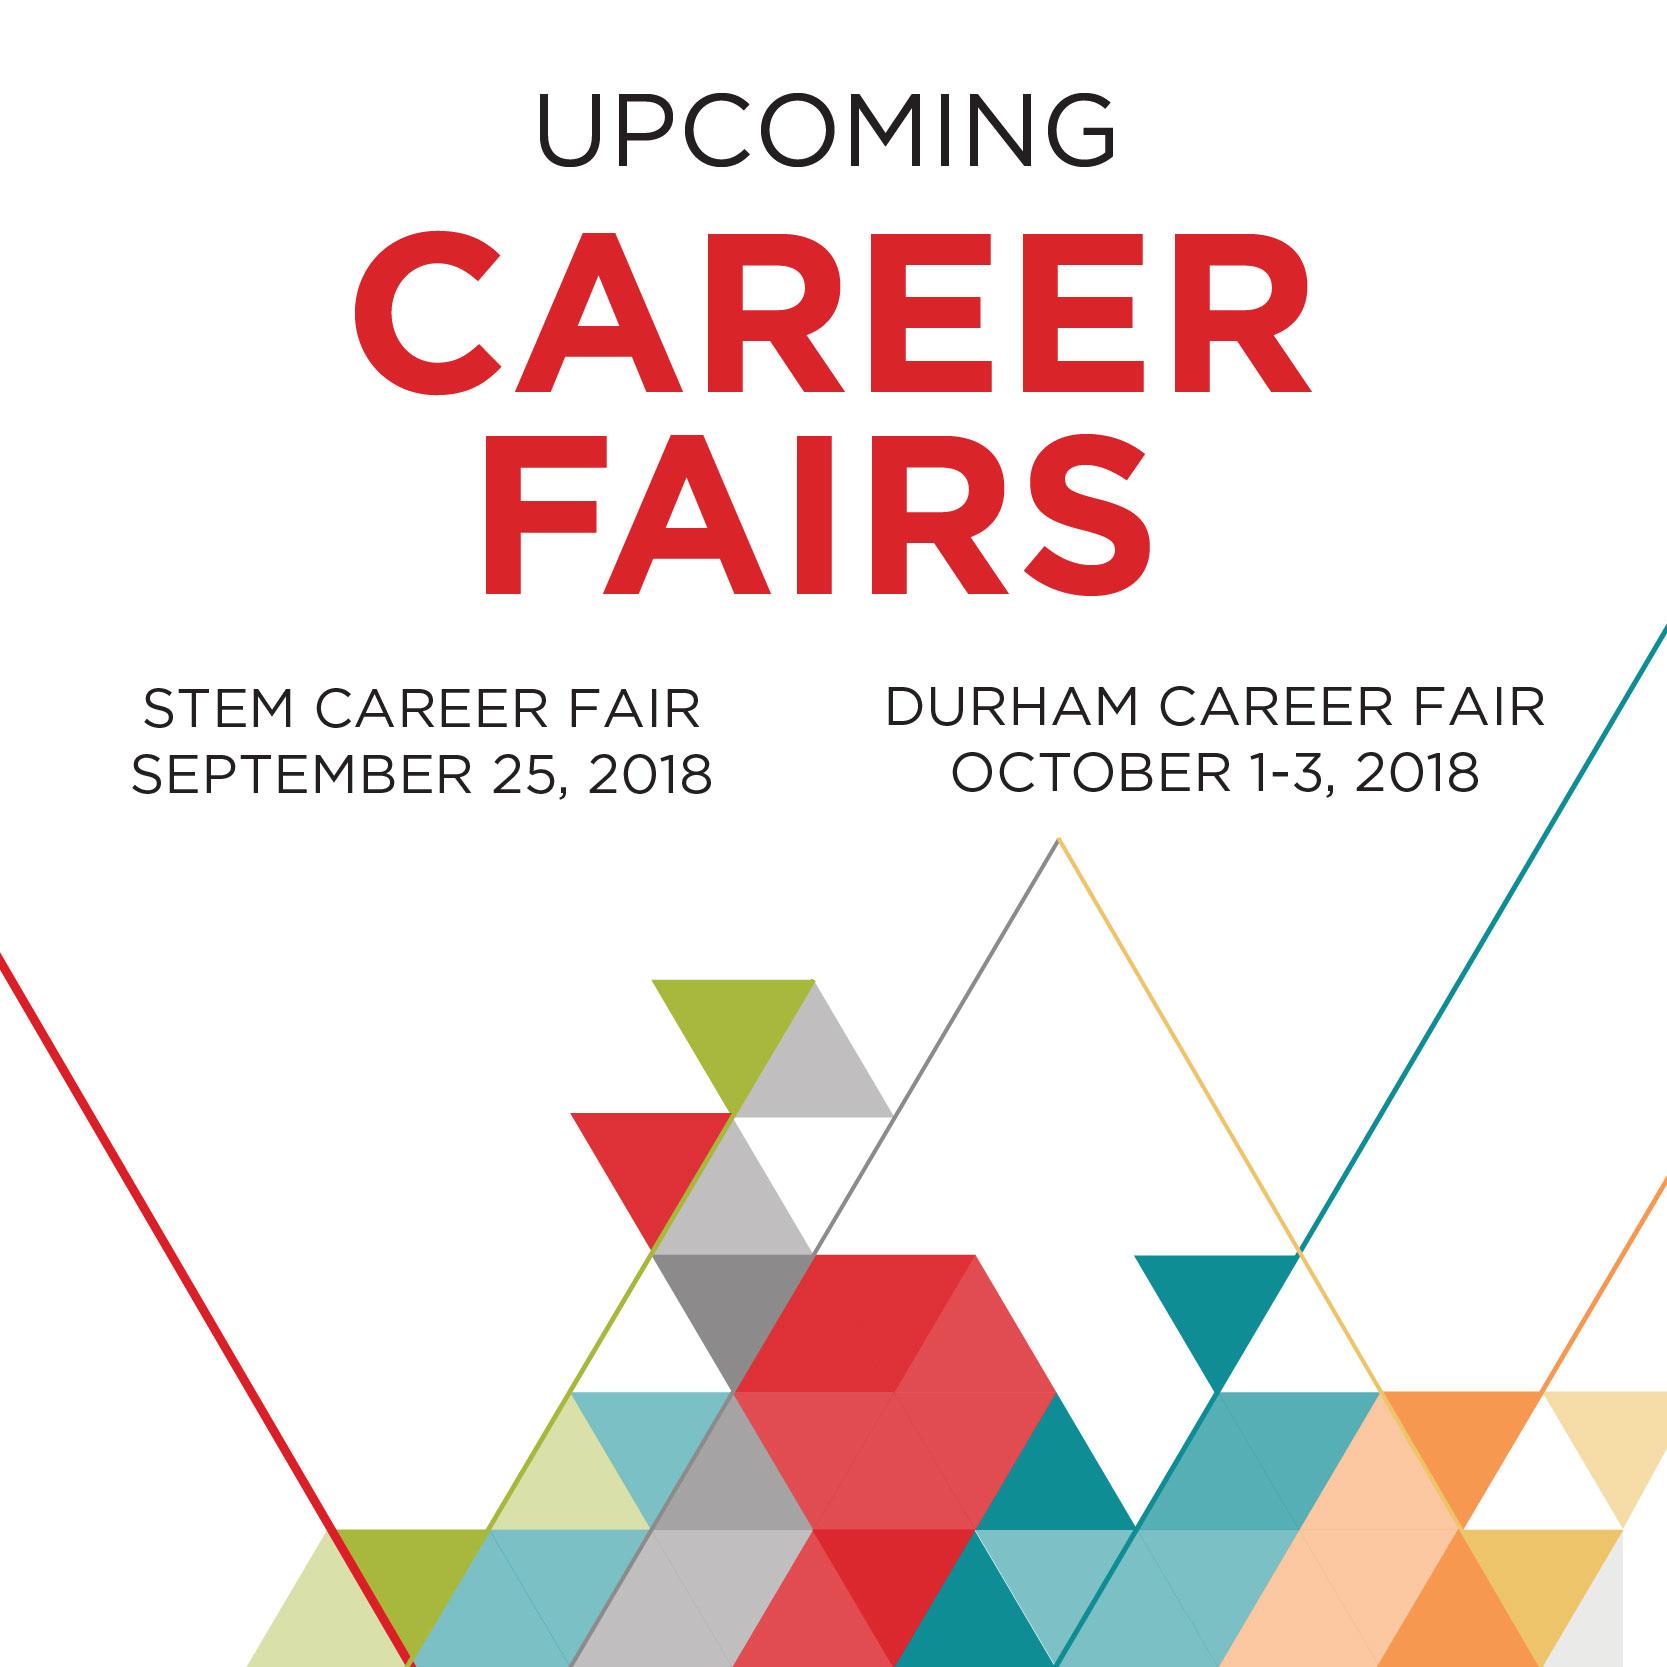 Upcoming Career Fairs: STEM Career Fair (Sept 25, 2018), Durham Career Fair (October 1-3, 2018)